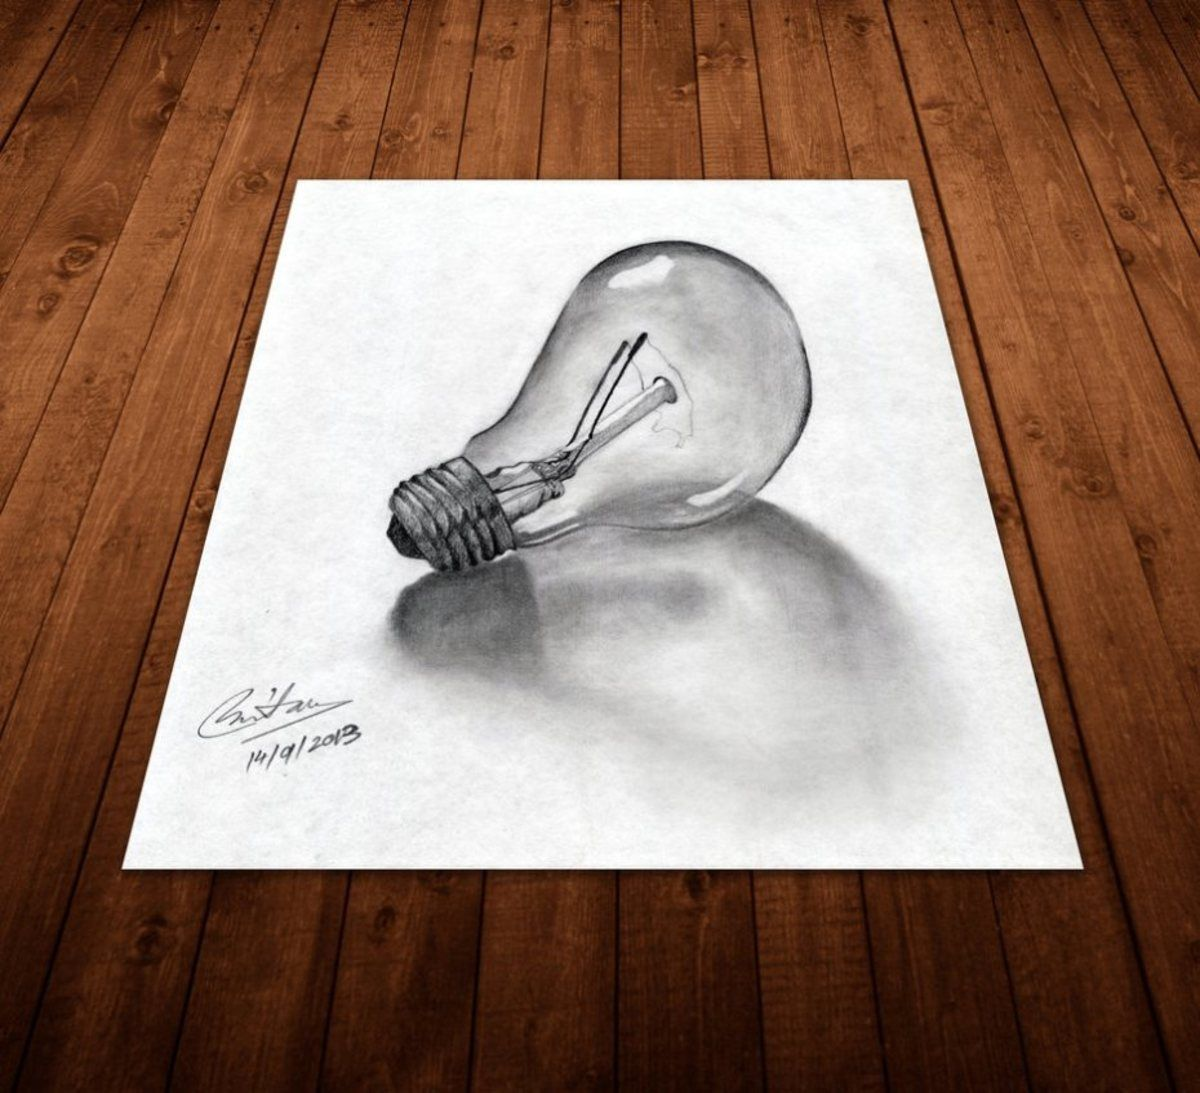 30 Incredible Examples of 3D Pencil Drawings